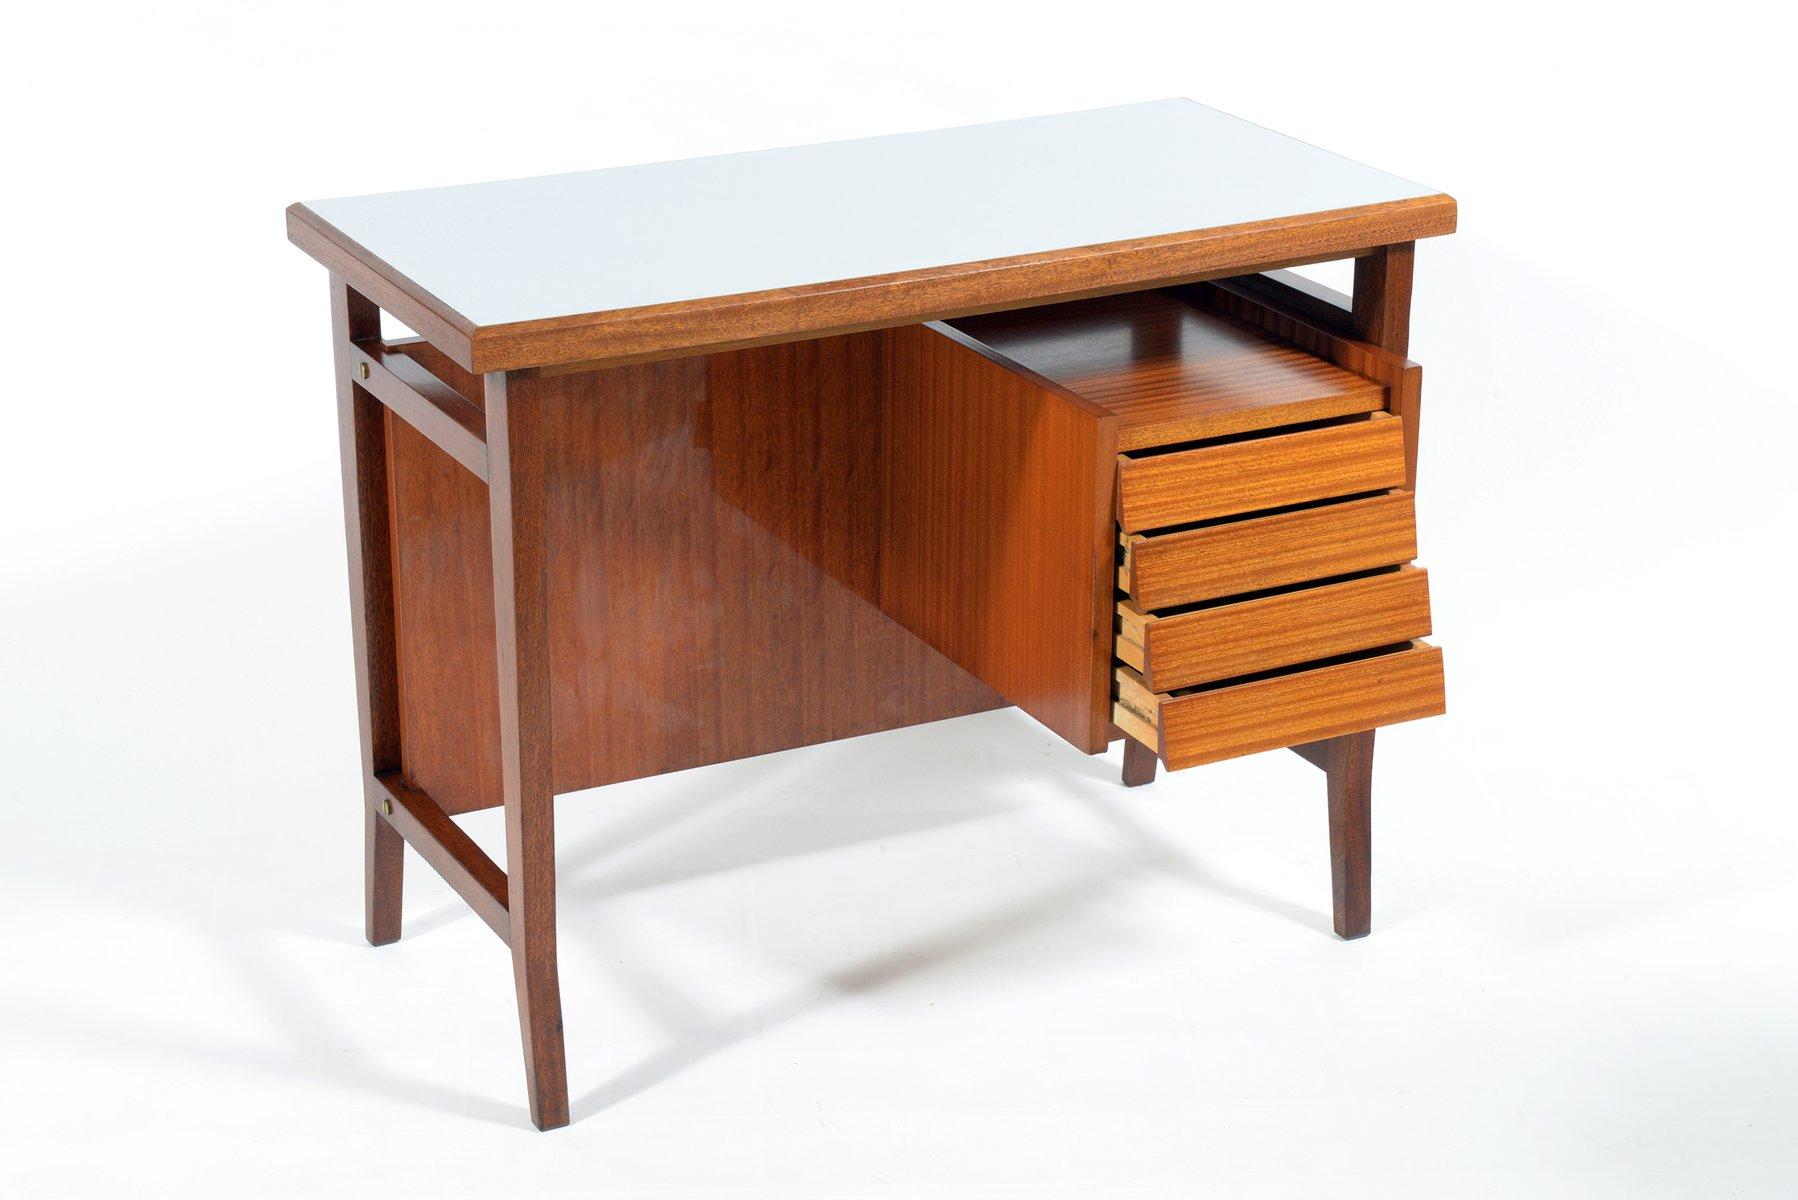 Small Italian Writing Desk By Gio Ponti For Schirolli